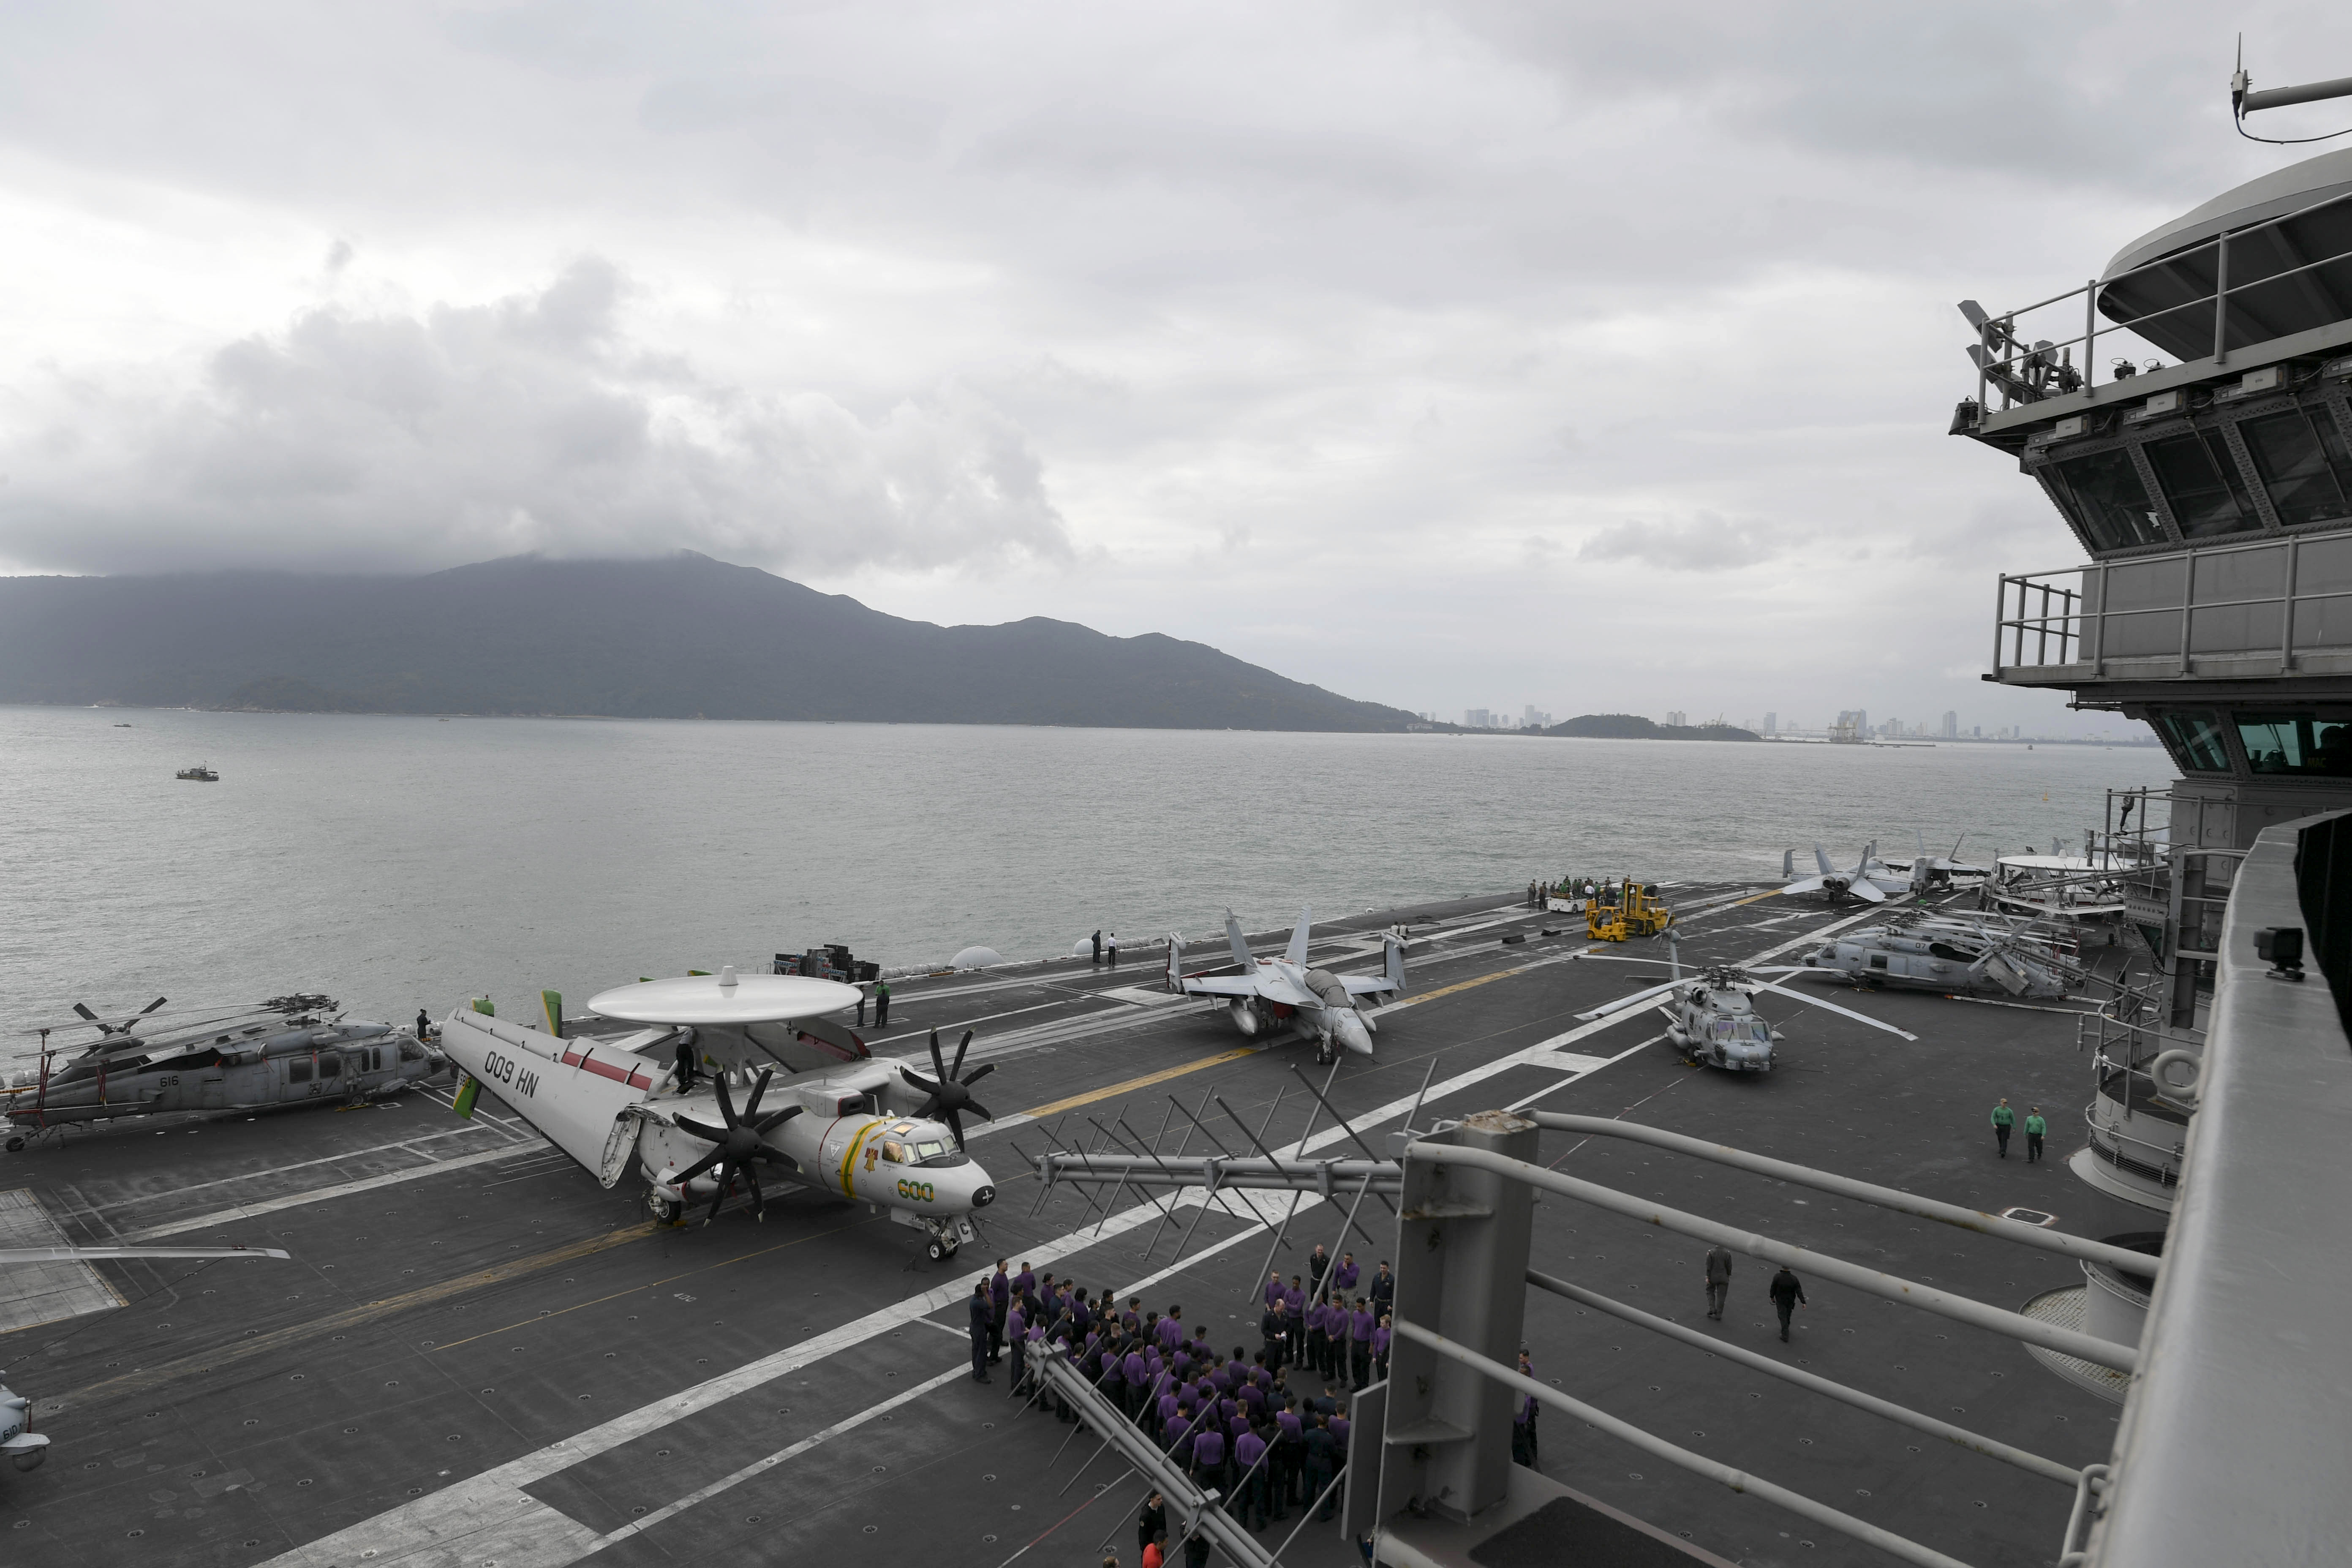 The aircraft carrier USS Theodore Roosevelt (CVN 71) arrives in Vietnam, March 5, 2020.